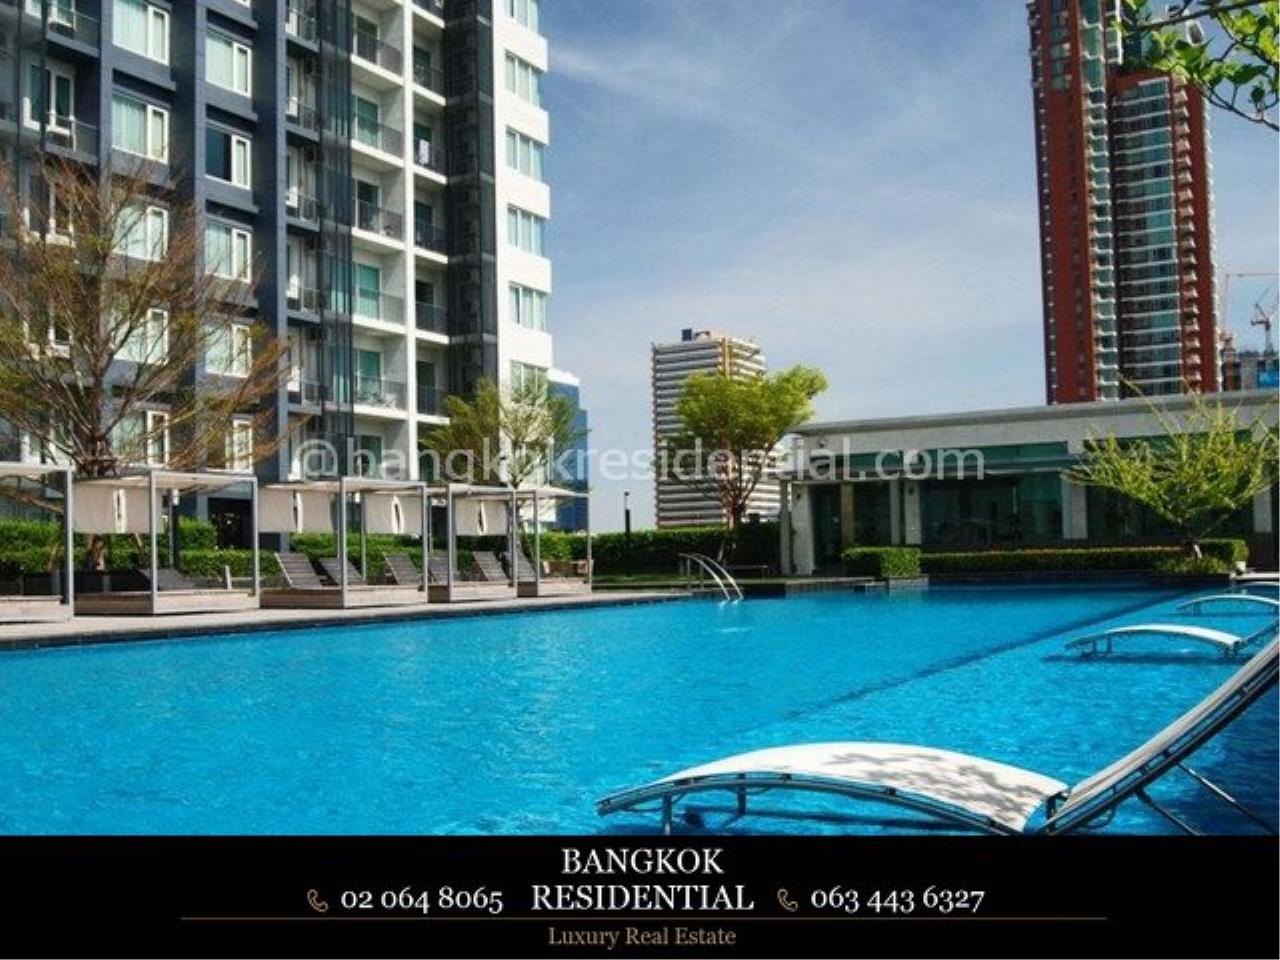 Bangkok Residential Agency's 1BR Siri at Sukhumvit For Rent (BR4782CD) 8